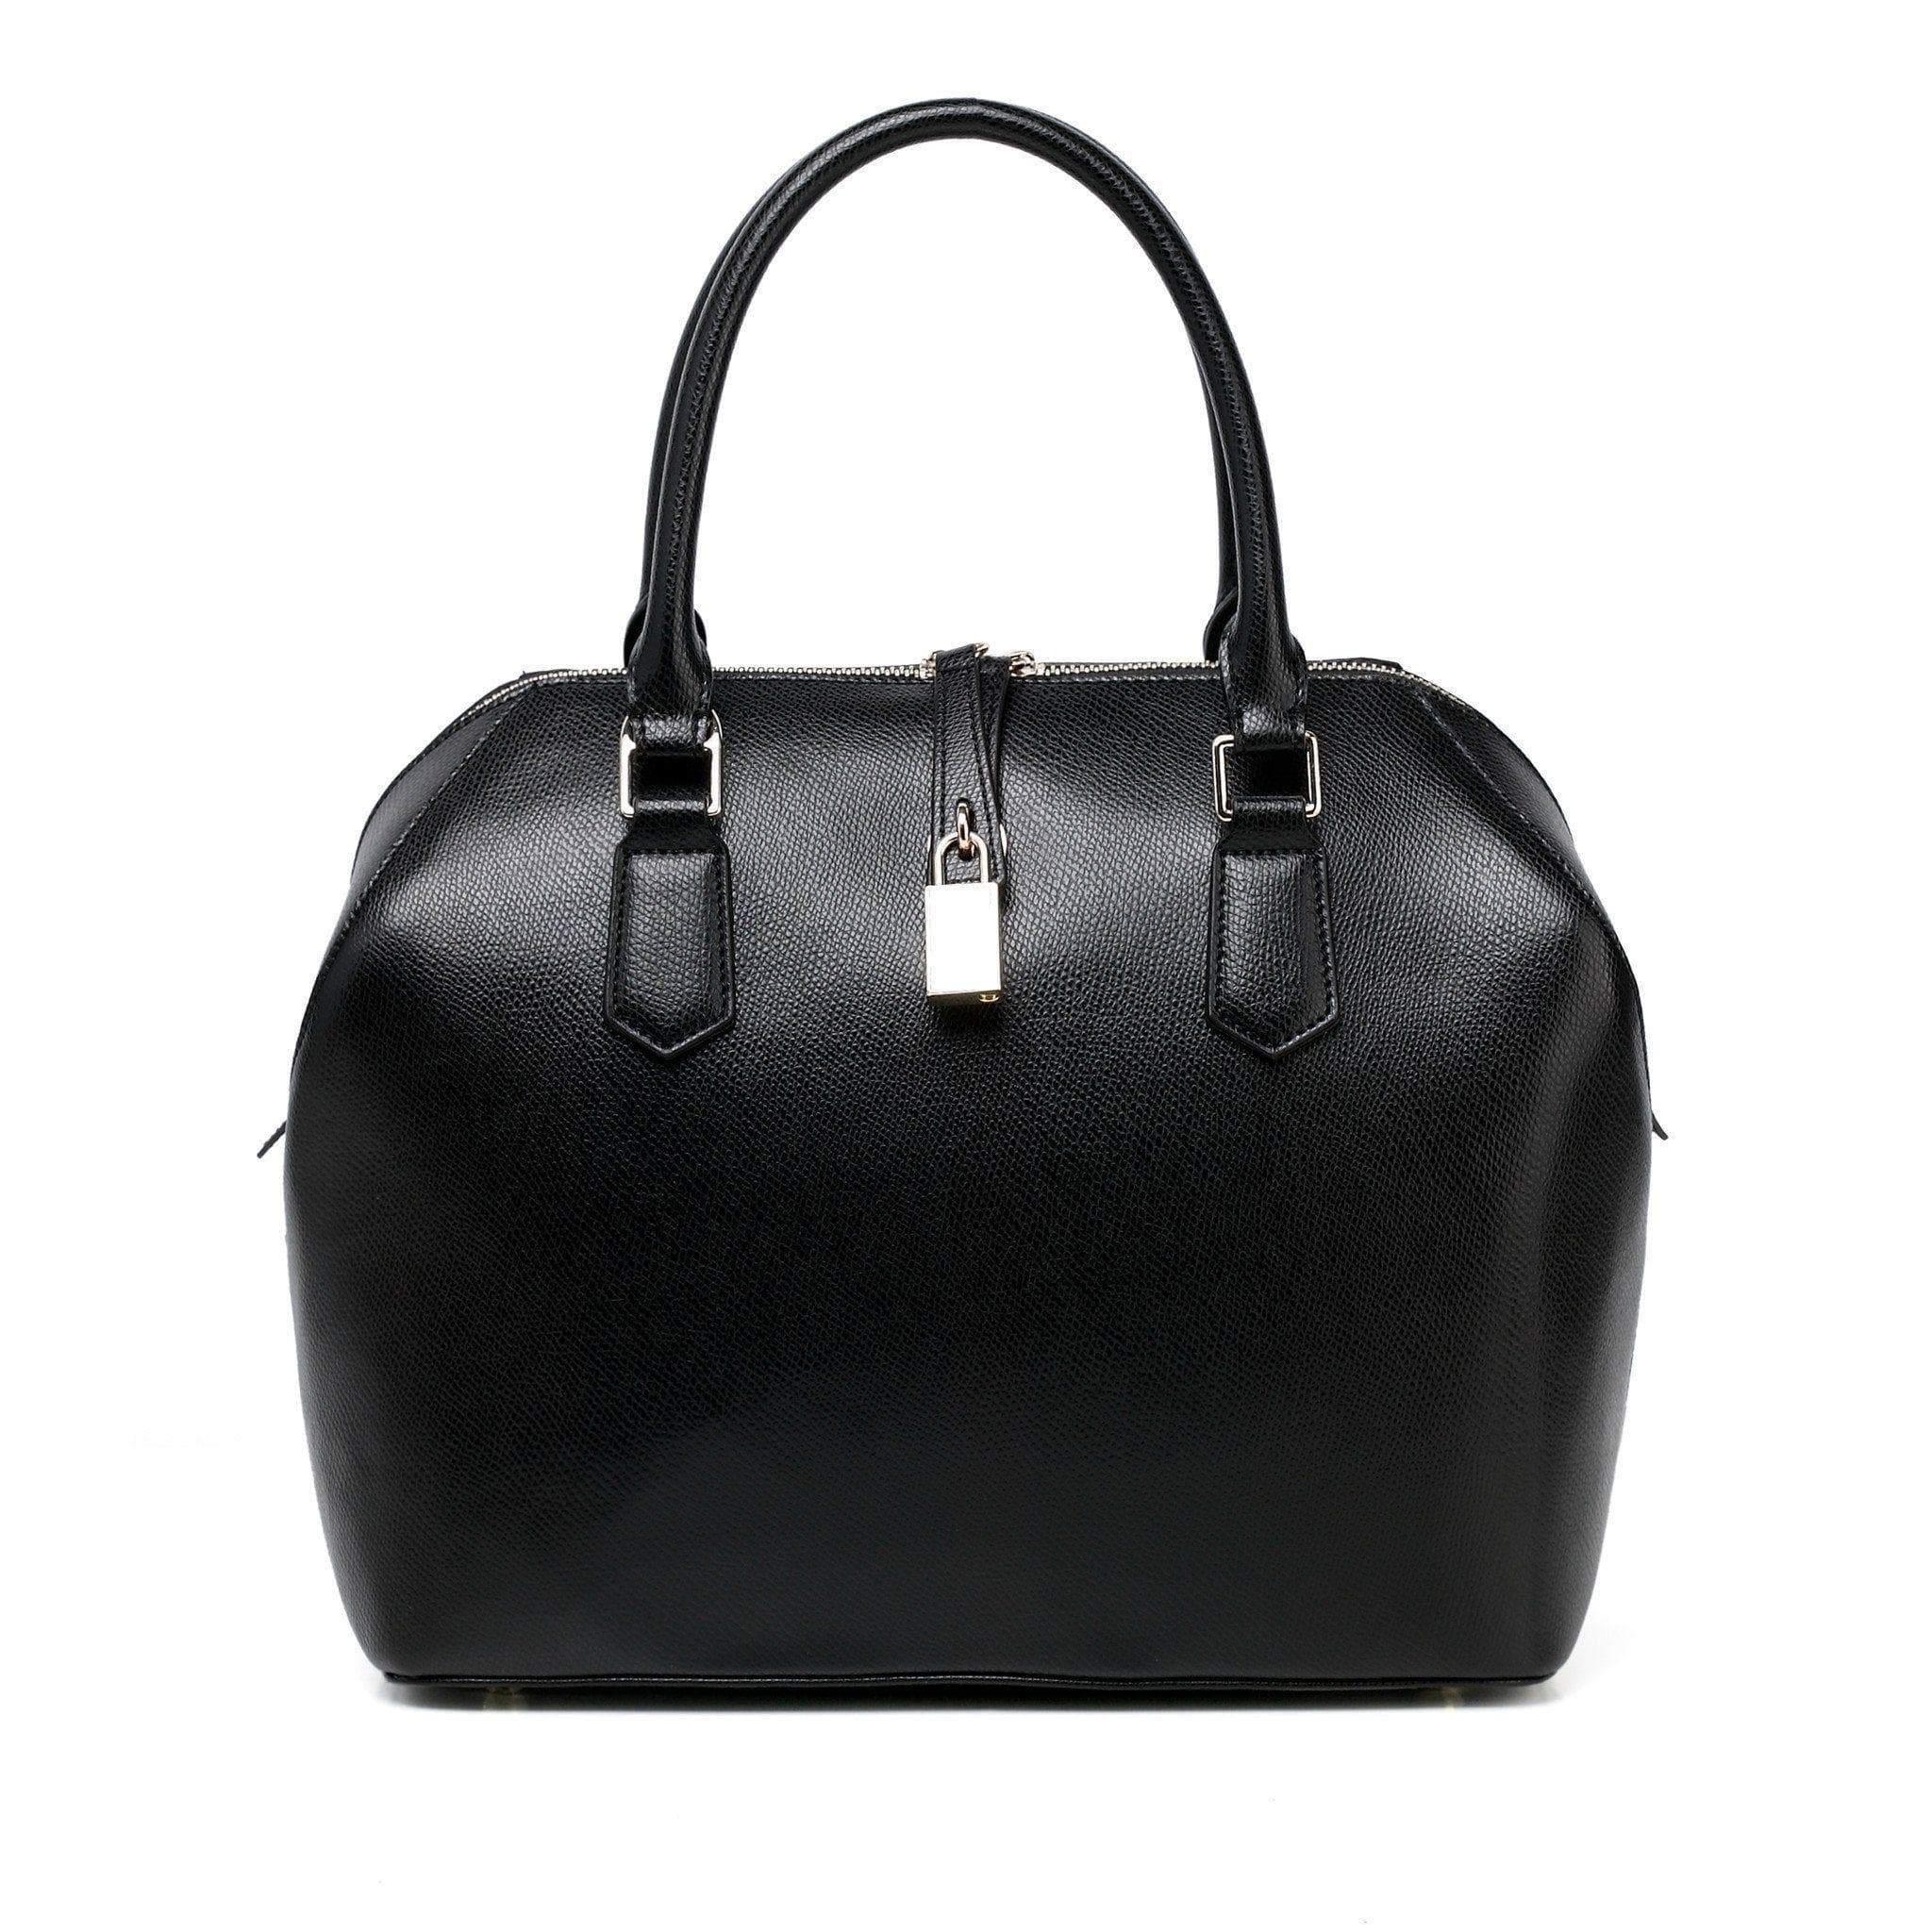 033c61c5fc Lucie Leather Top Handle Handbag - Black